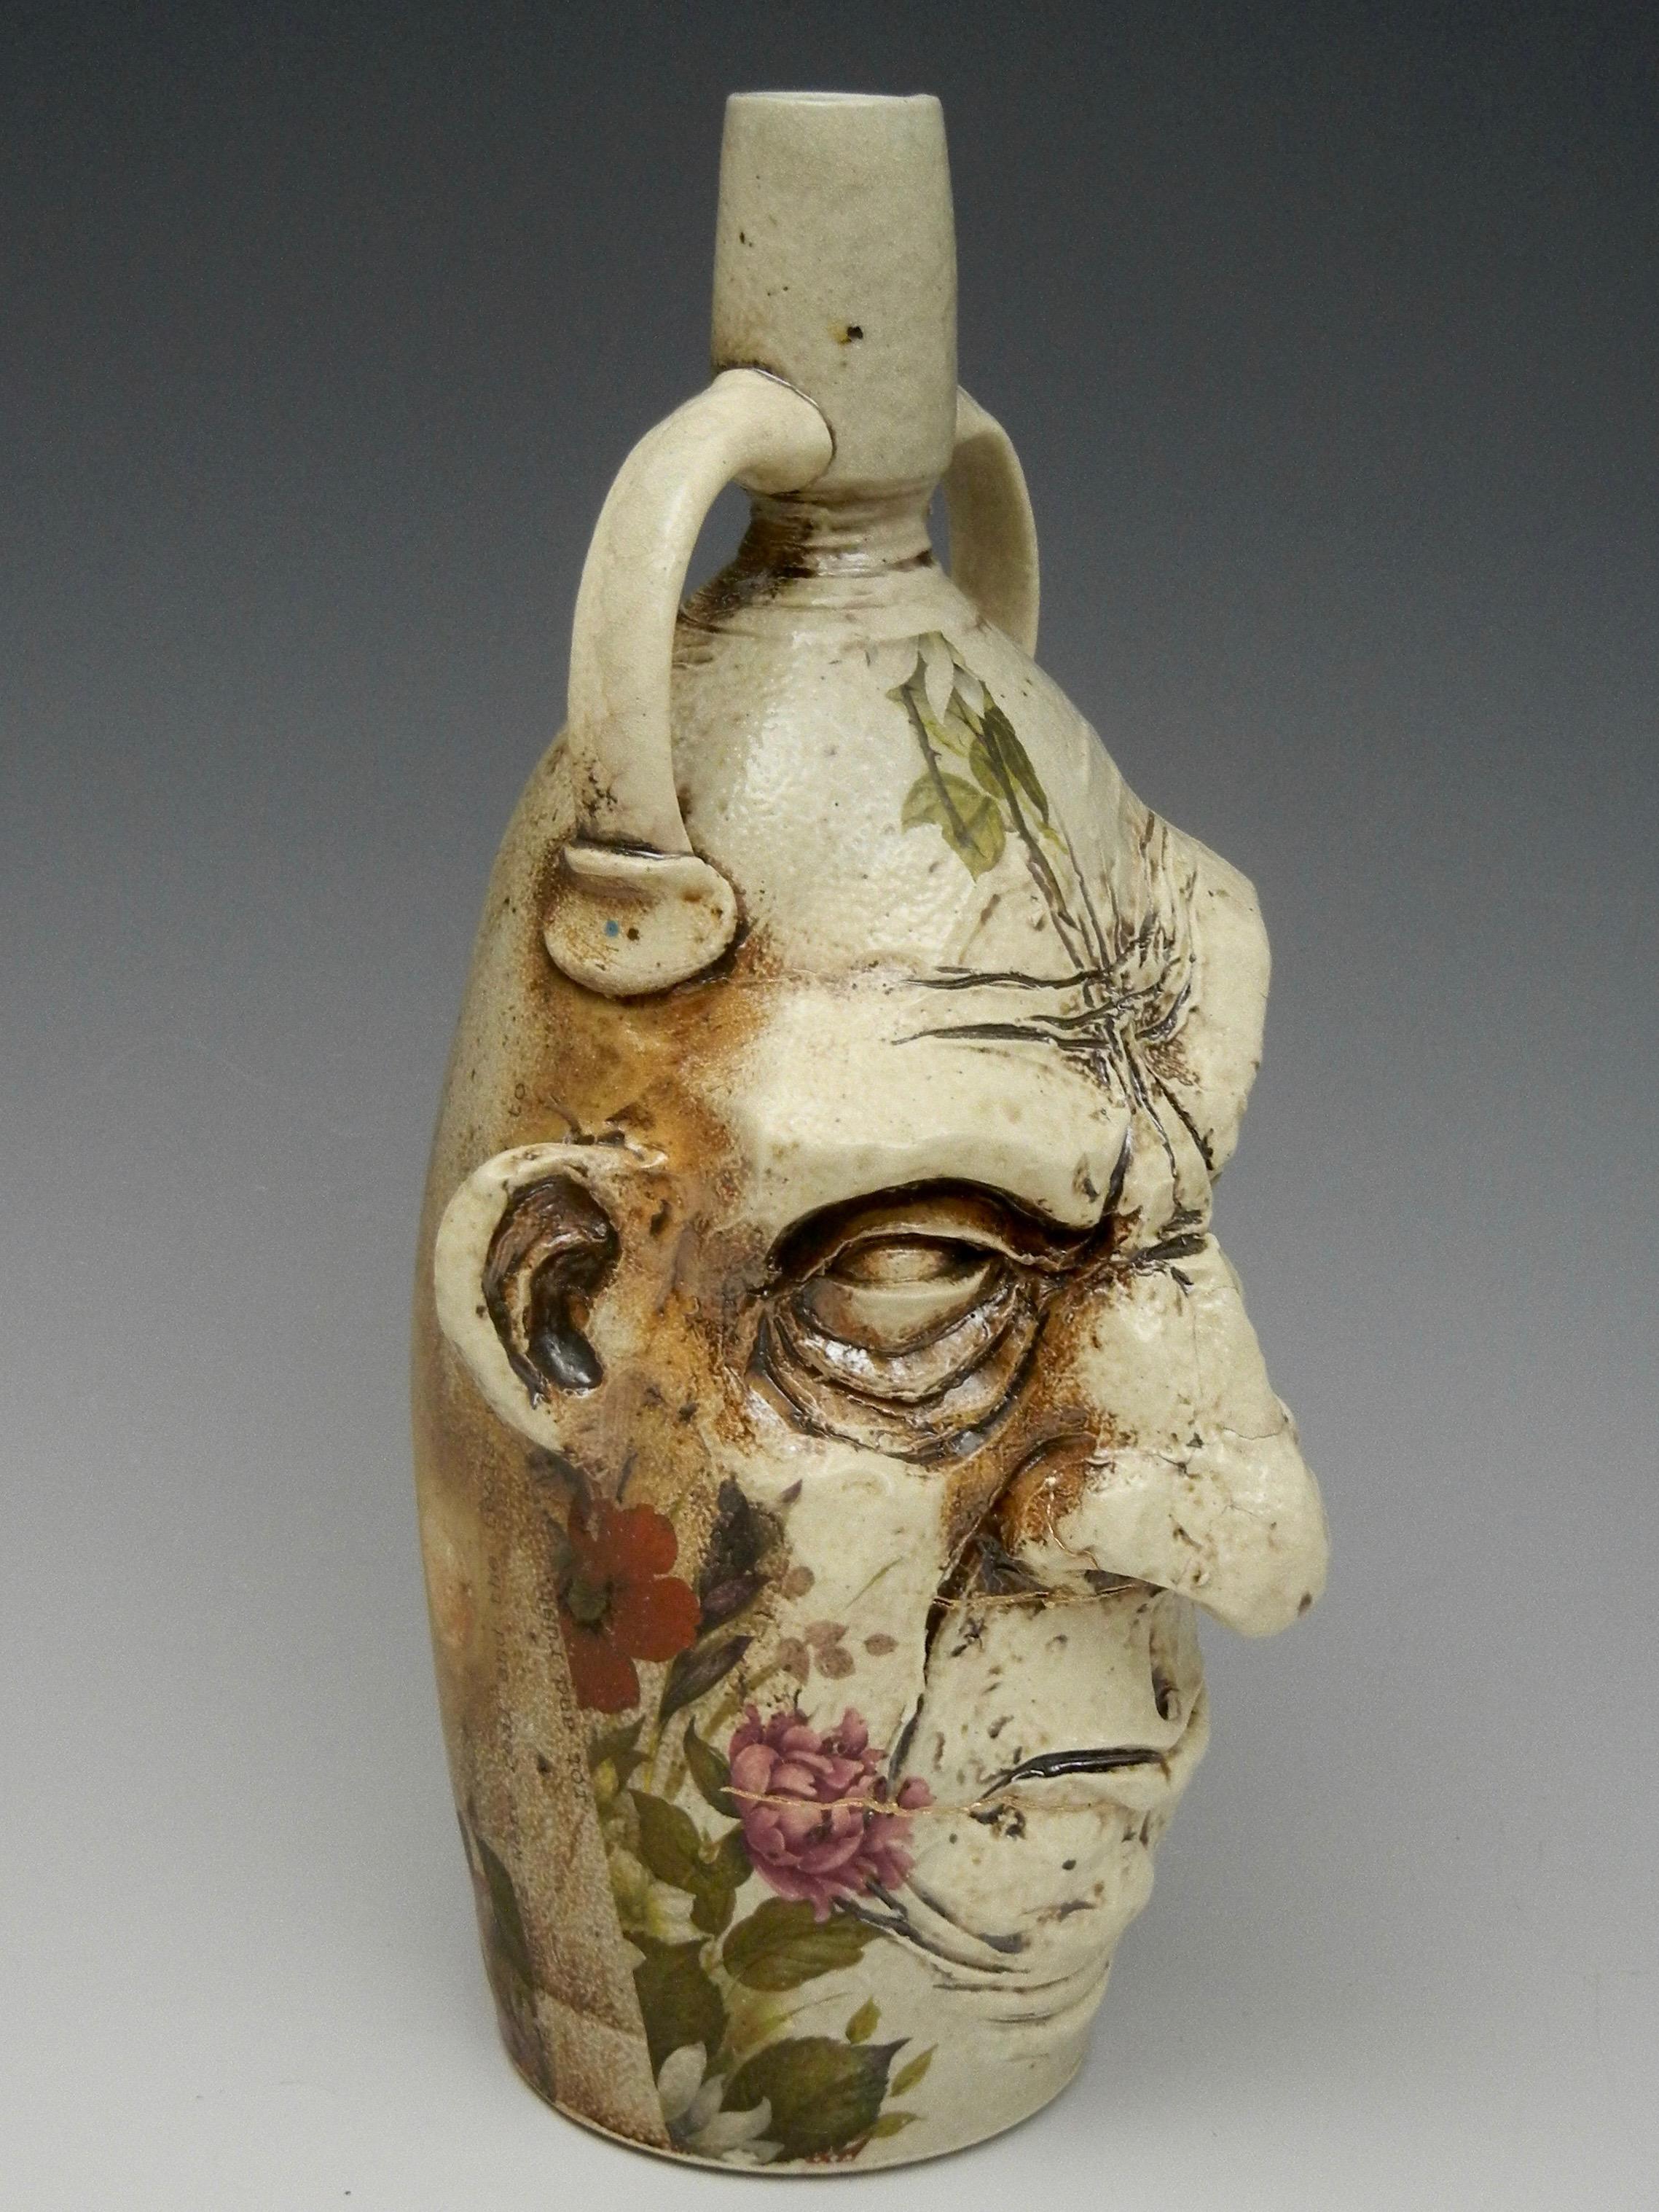 Lorenz Pottery, handmade, ceramics, pottery, folk pottery, wood fired, soda fired, jug, face jug, bottle, ugly jug